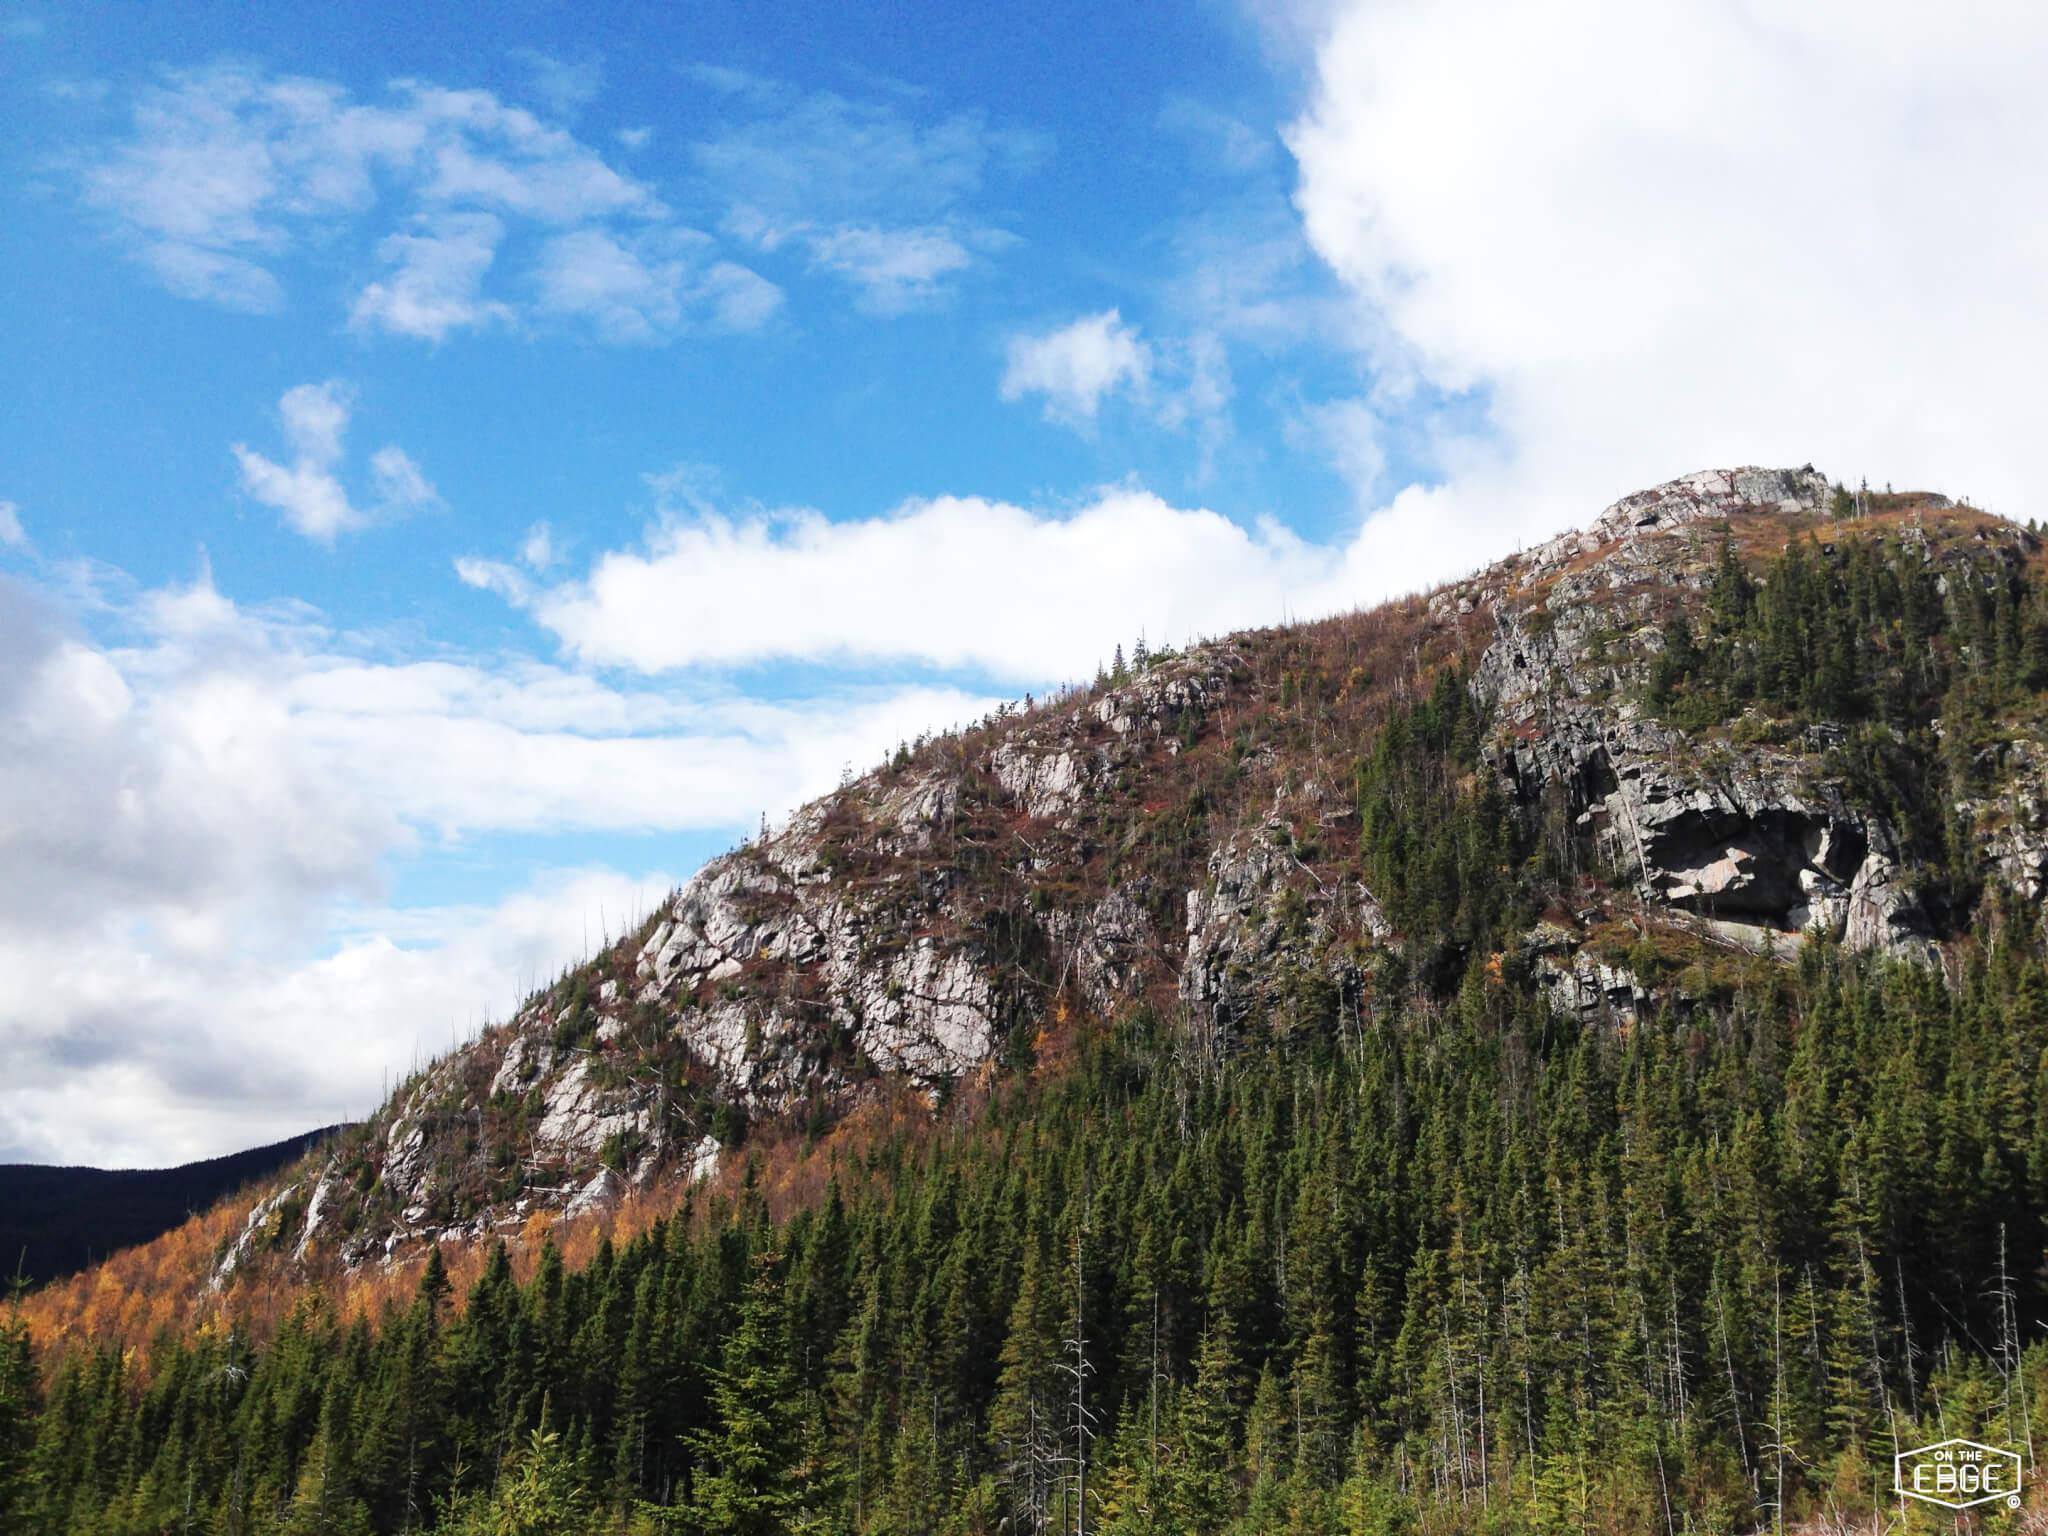 Sentier Pioui – Parc national des Grands-Jardins – Versant plein air